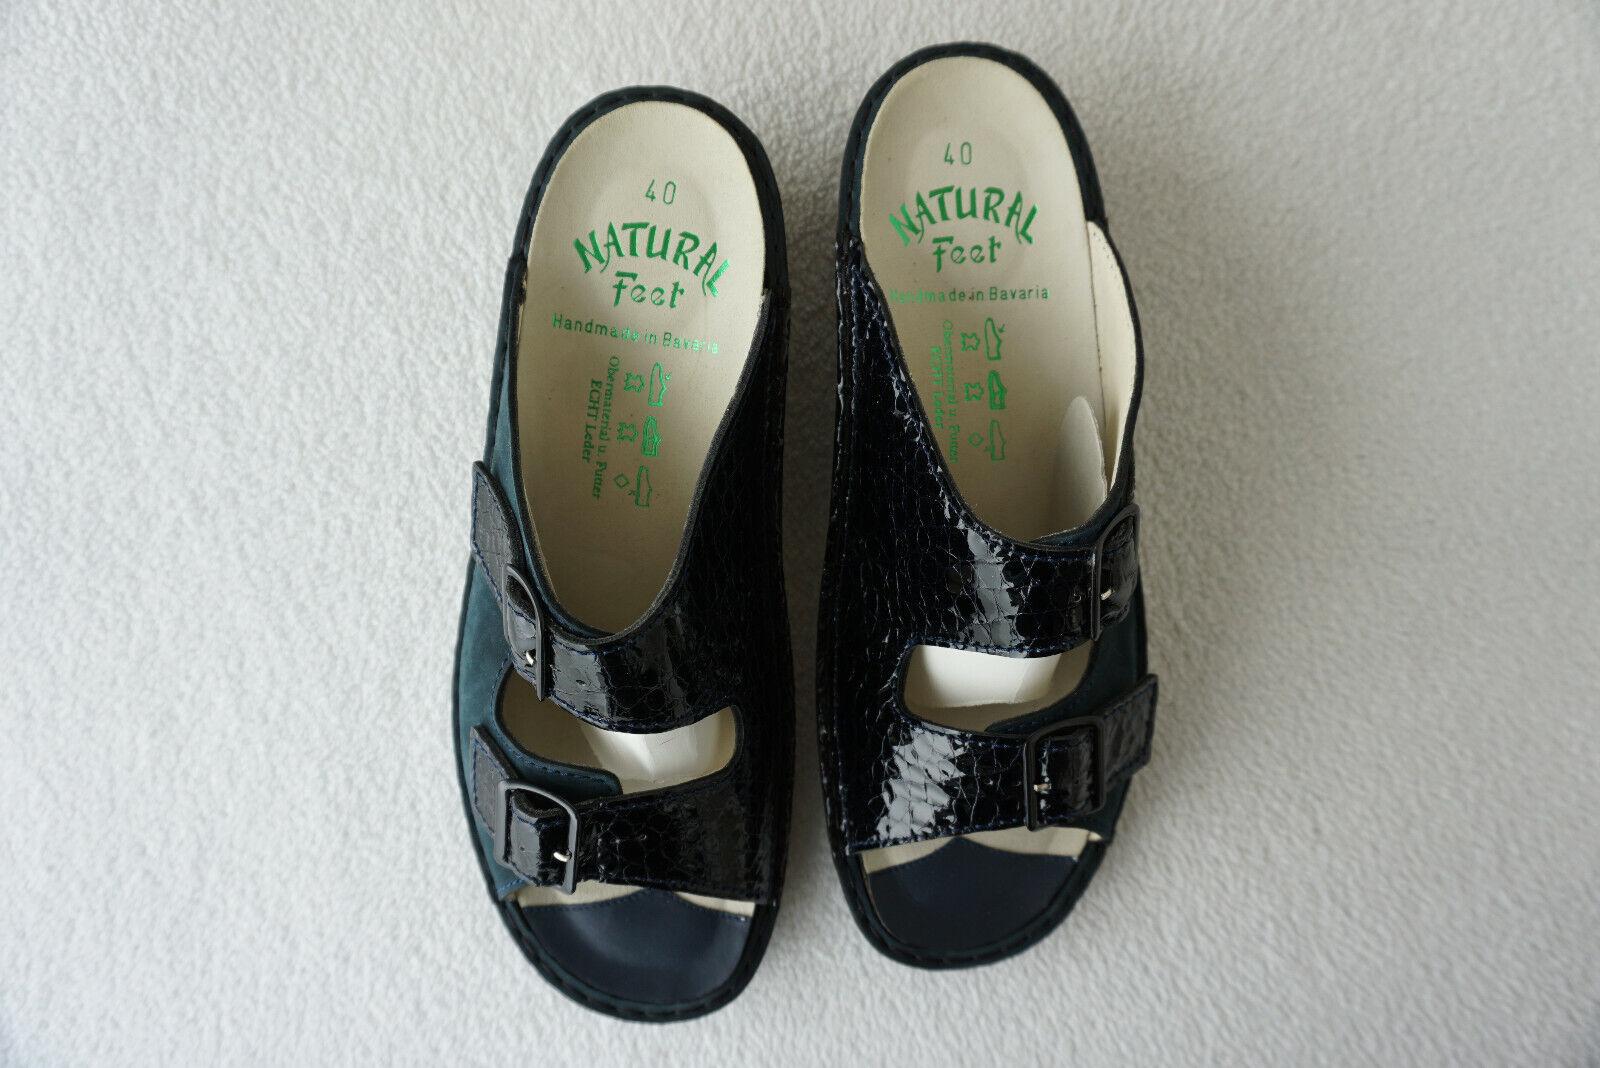 Ortopédico natural feet señora sandalia zapatos velcro talla 41 azul marino de cuero nuevo